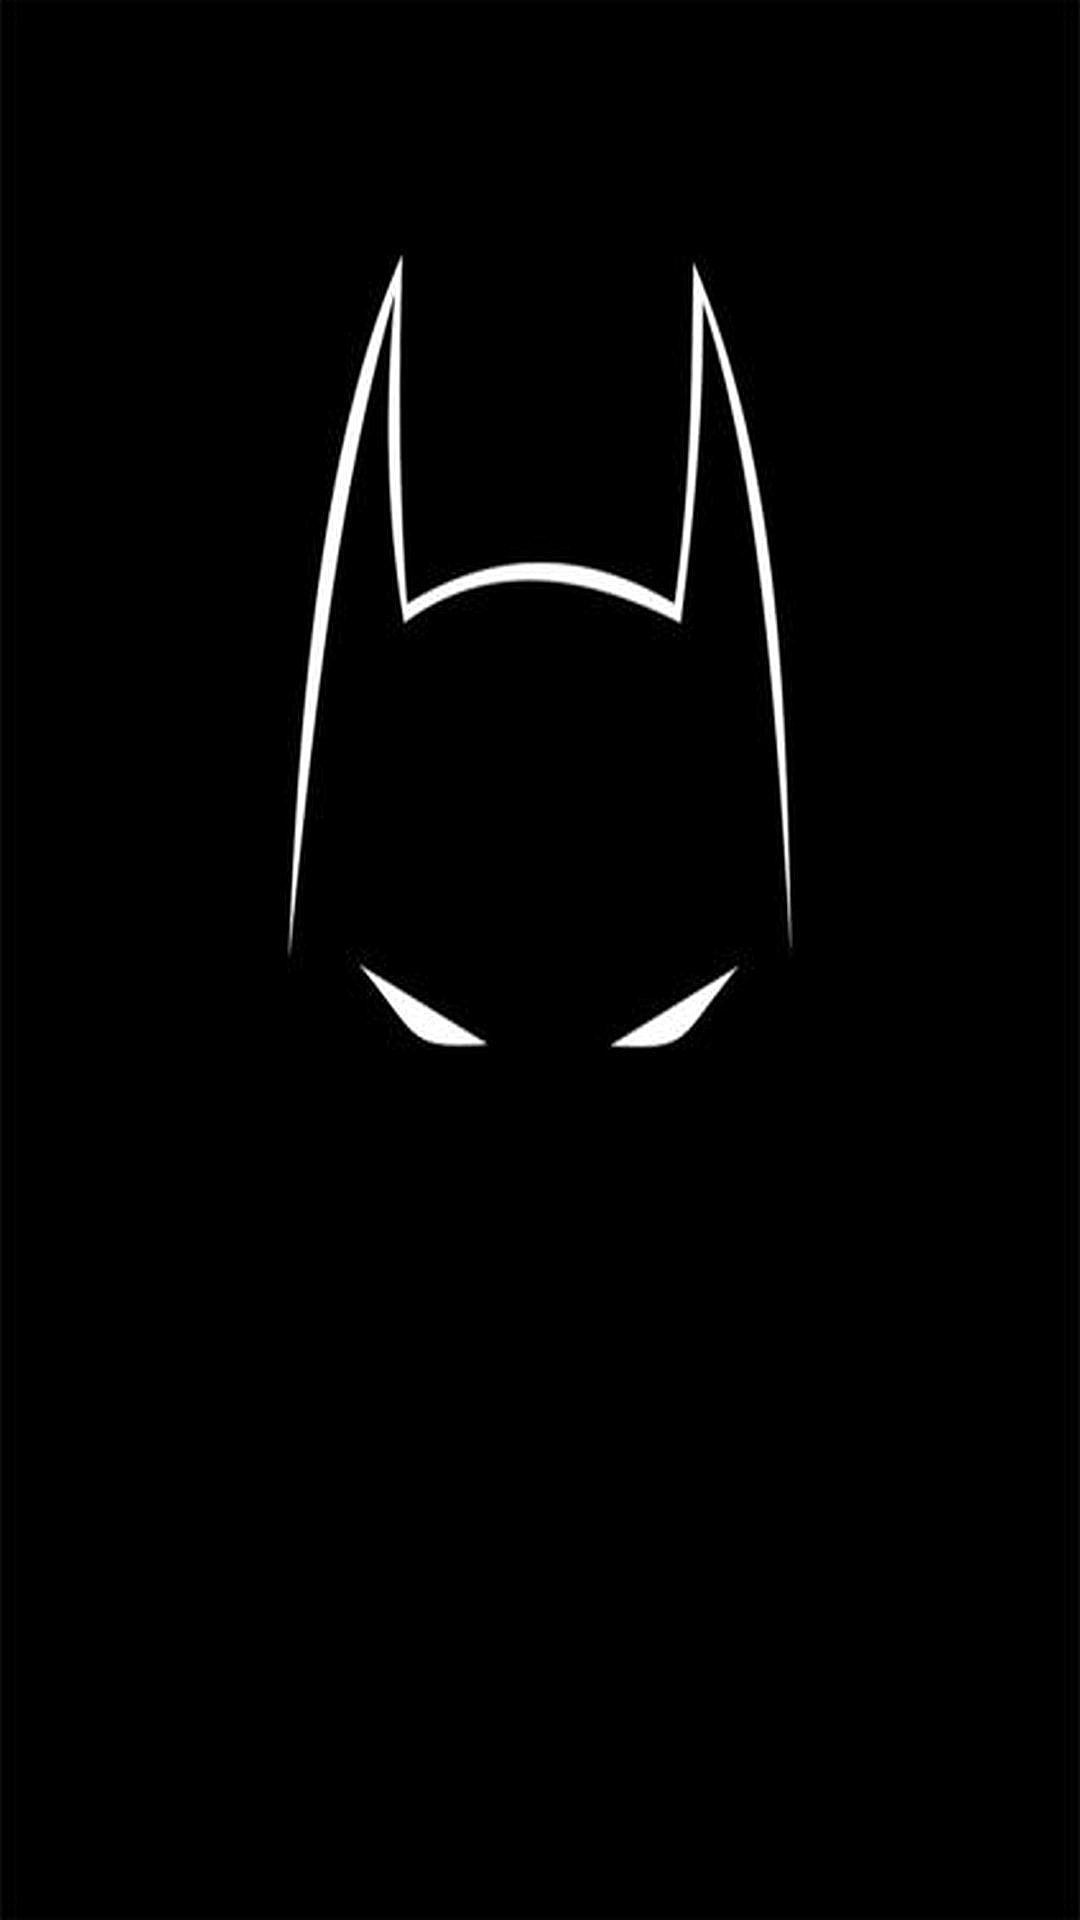 Batman animated series wallpaper 73 images for Sfondi batman